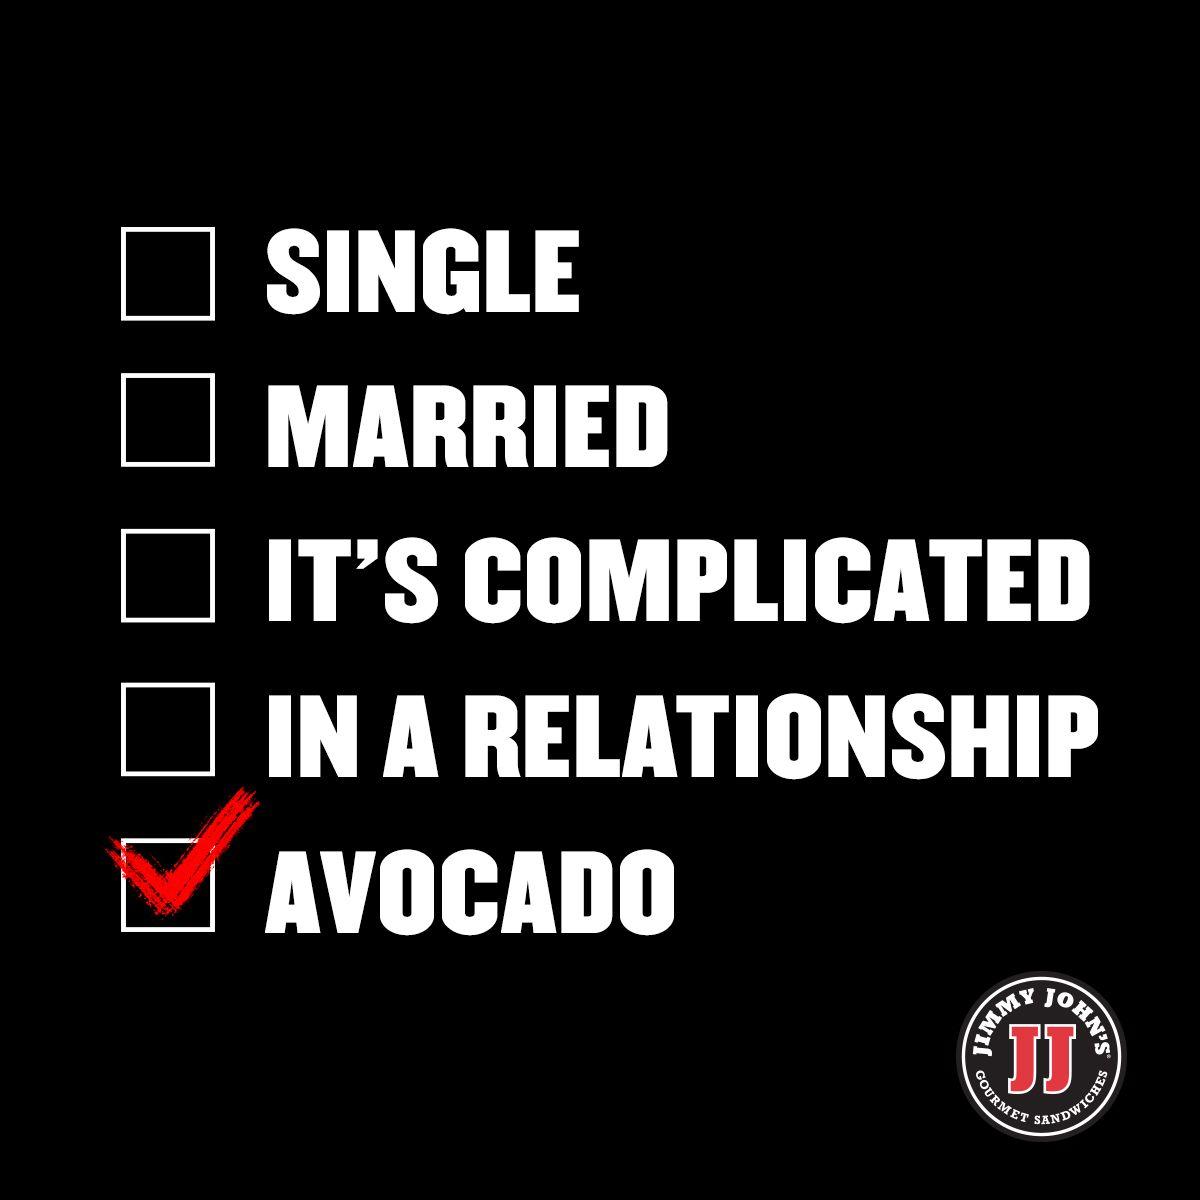 Relationship Status Avocado Relationship Status Single Life Humor Quirky Quotes